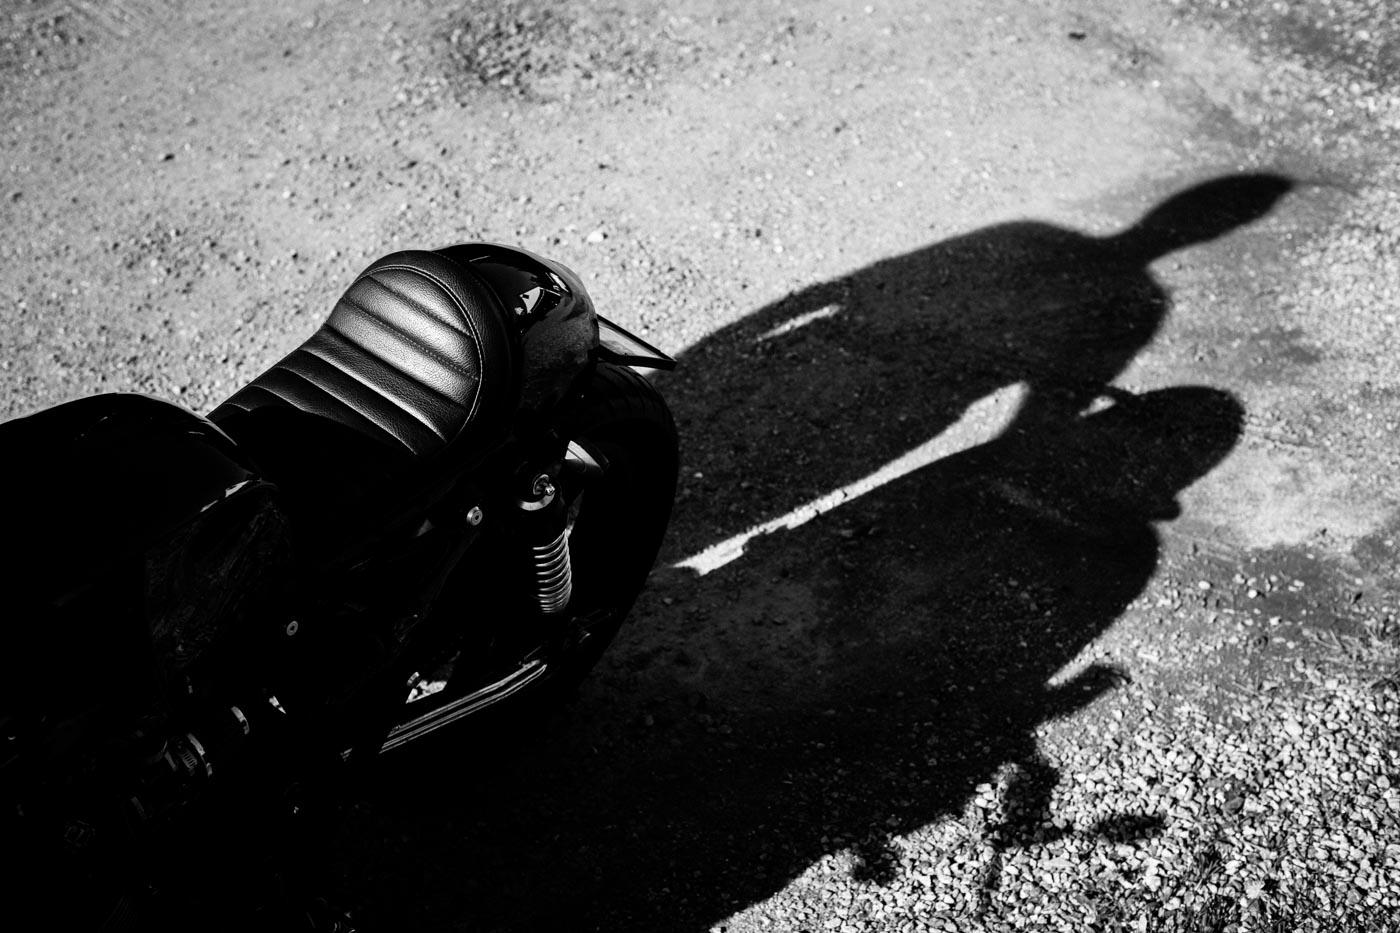 Black & White Photography_Man I © Alan Thomas Duncan Wilkie-1.jpg